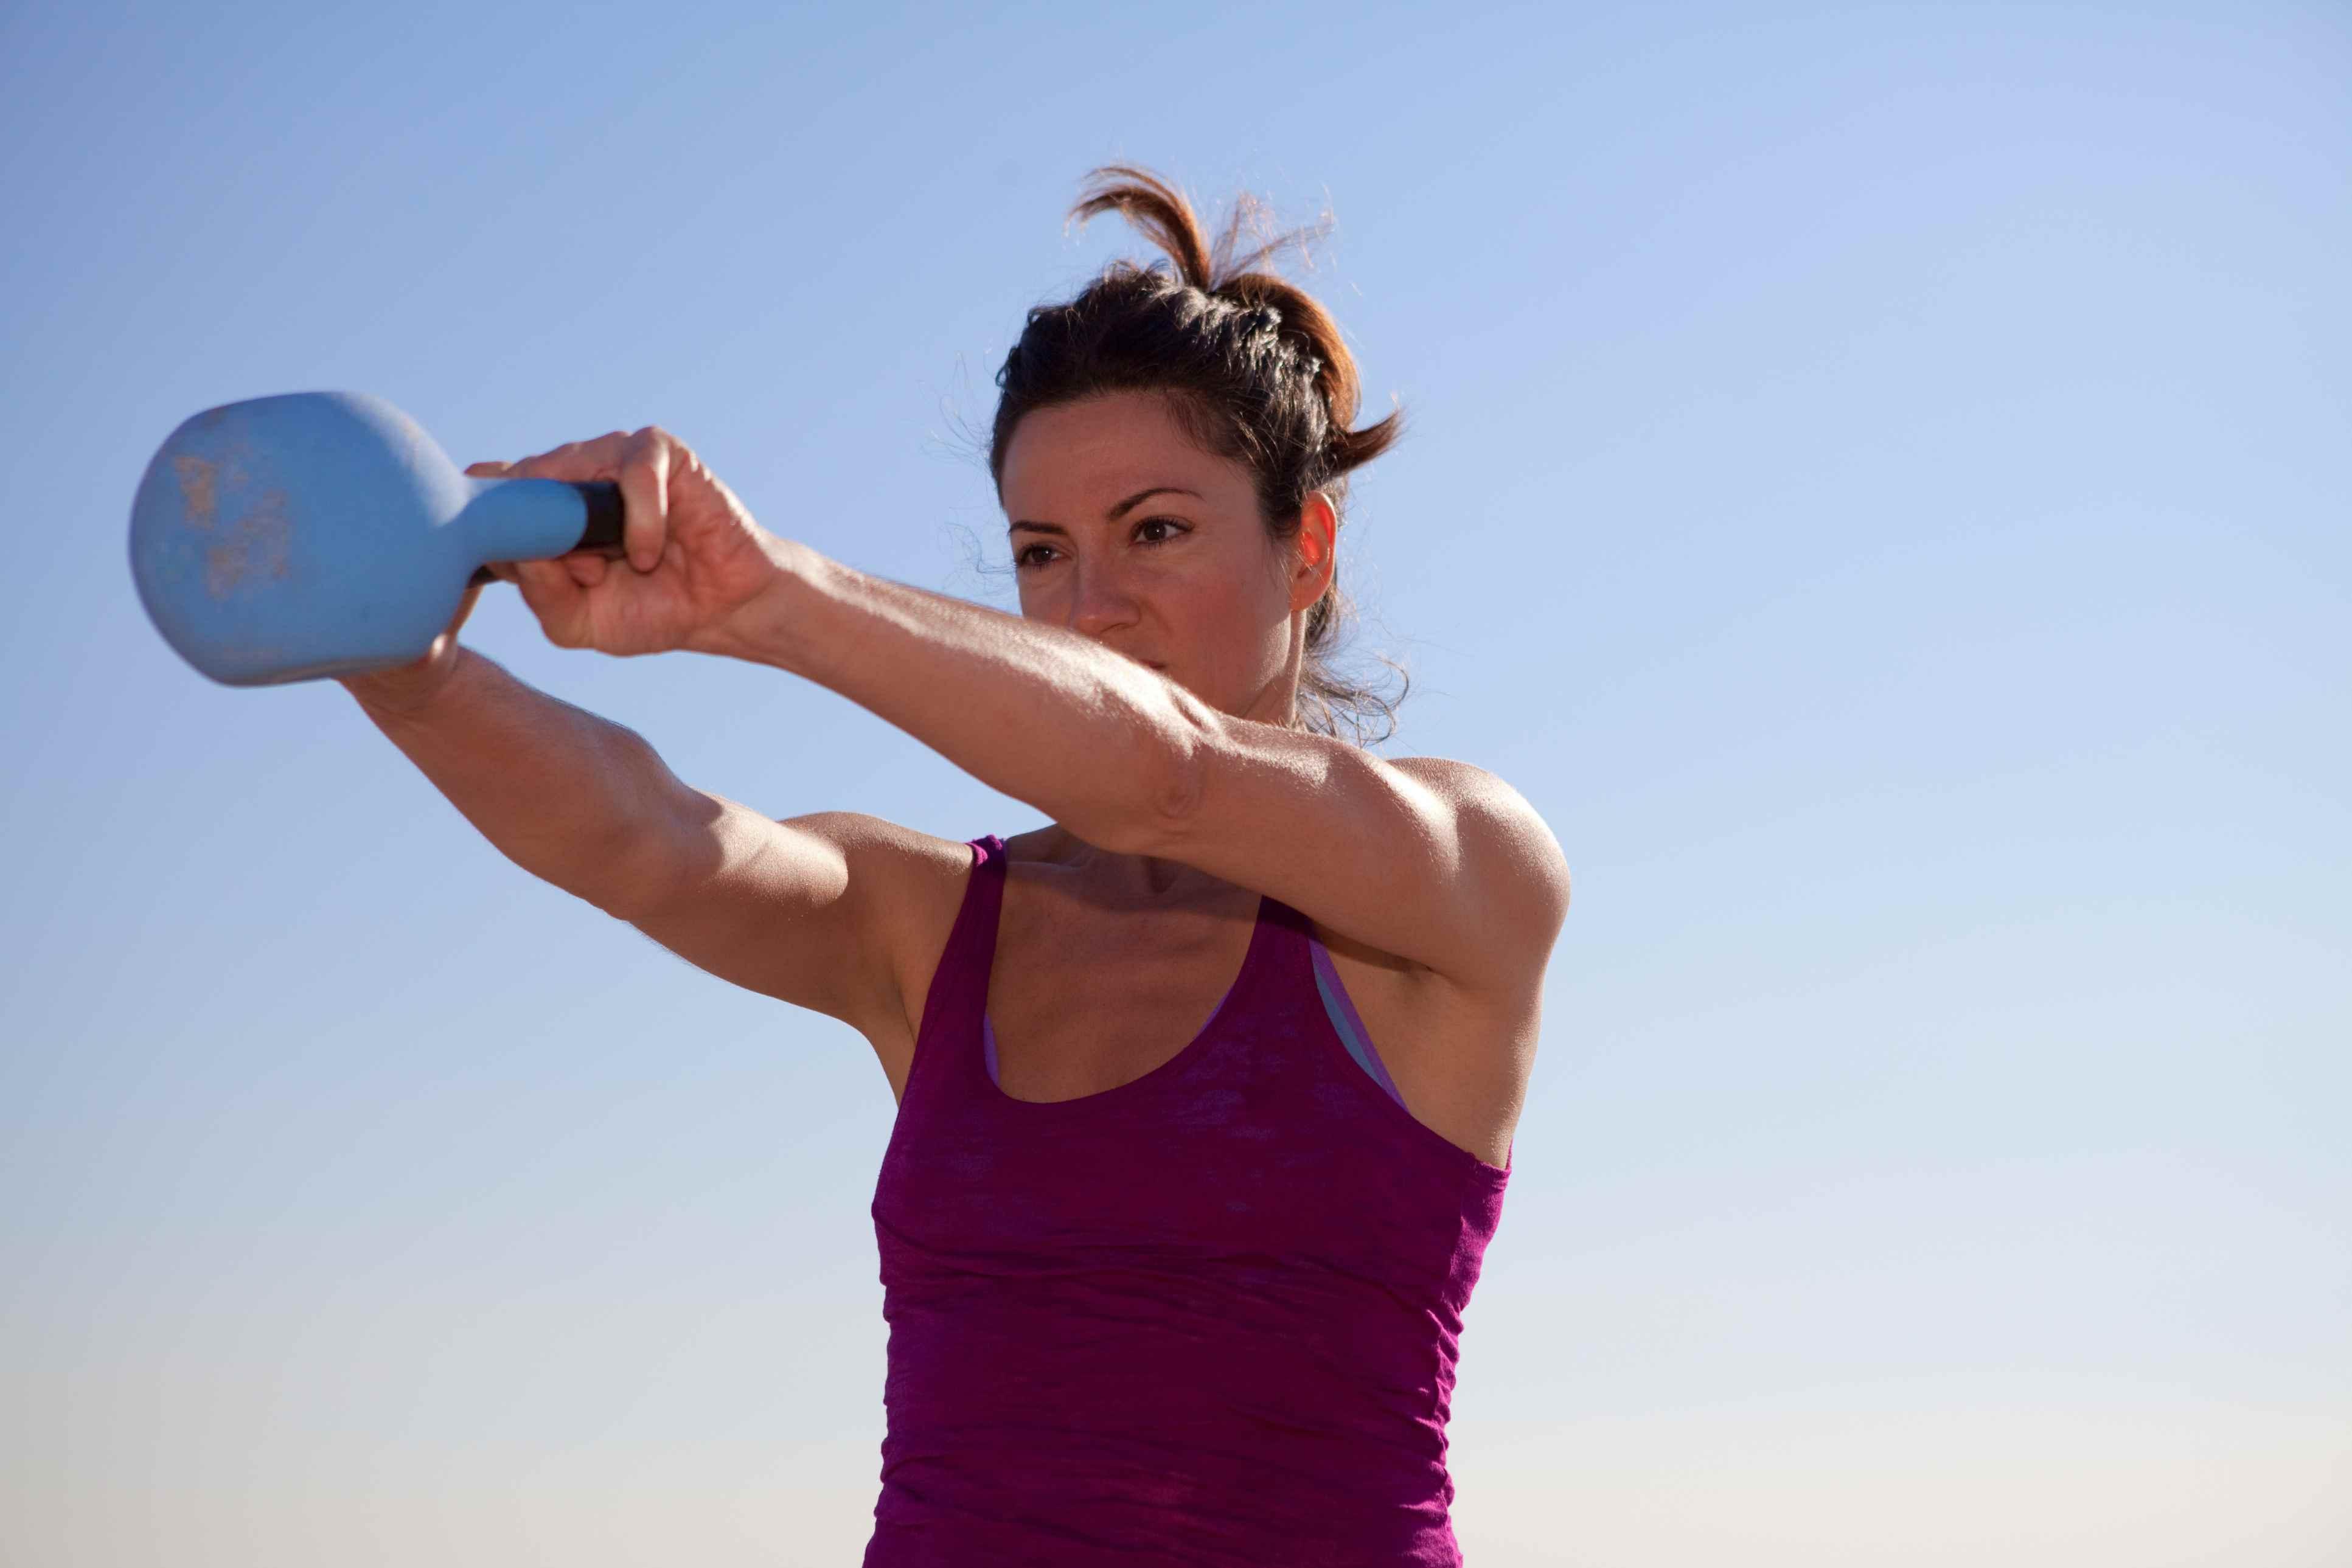 Woman swinging kettlebell